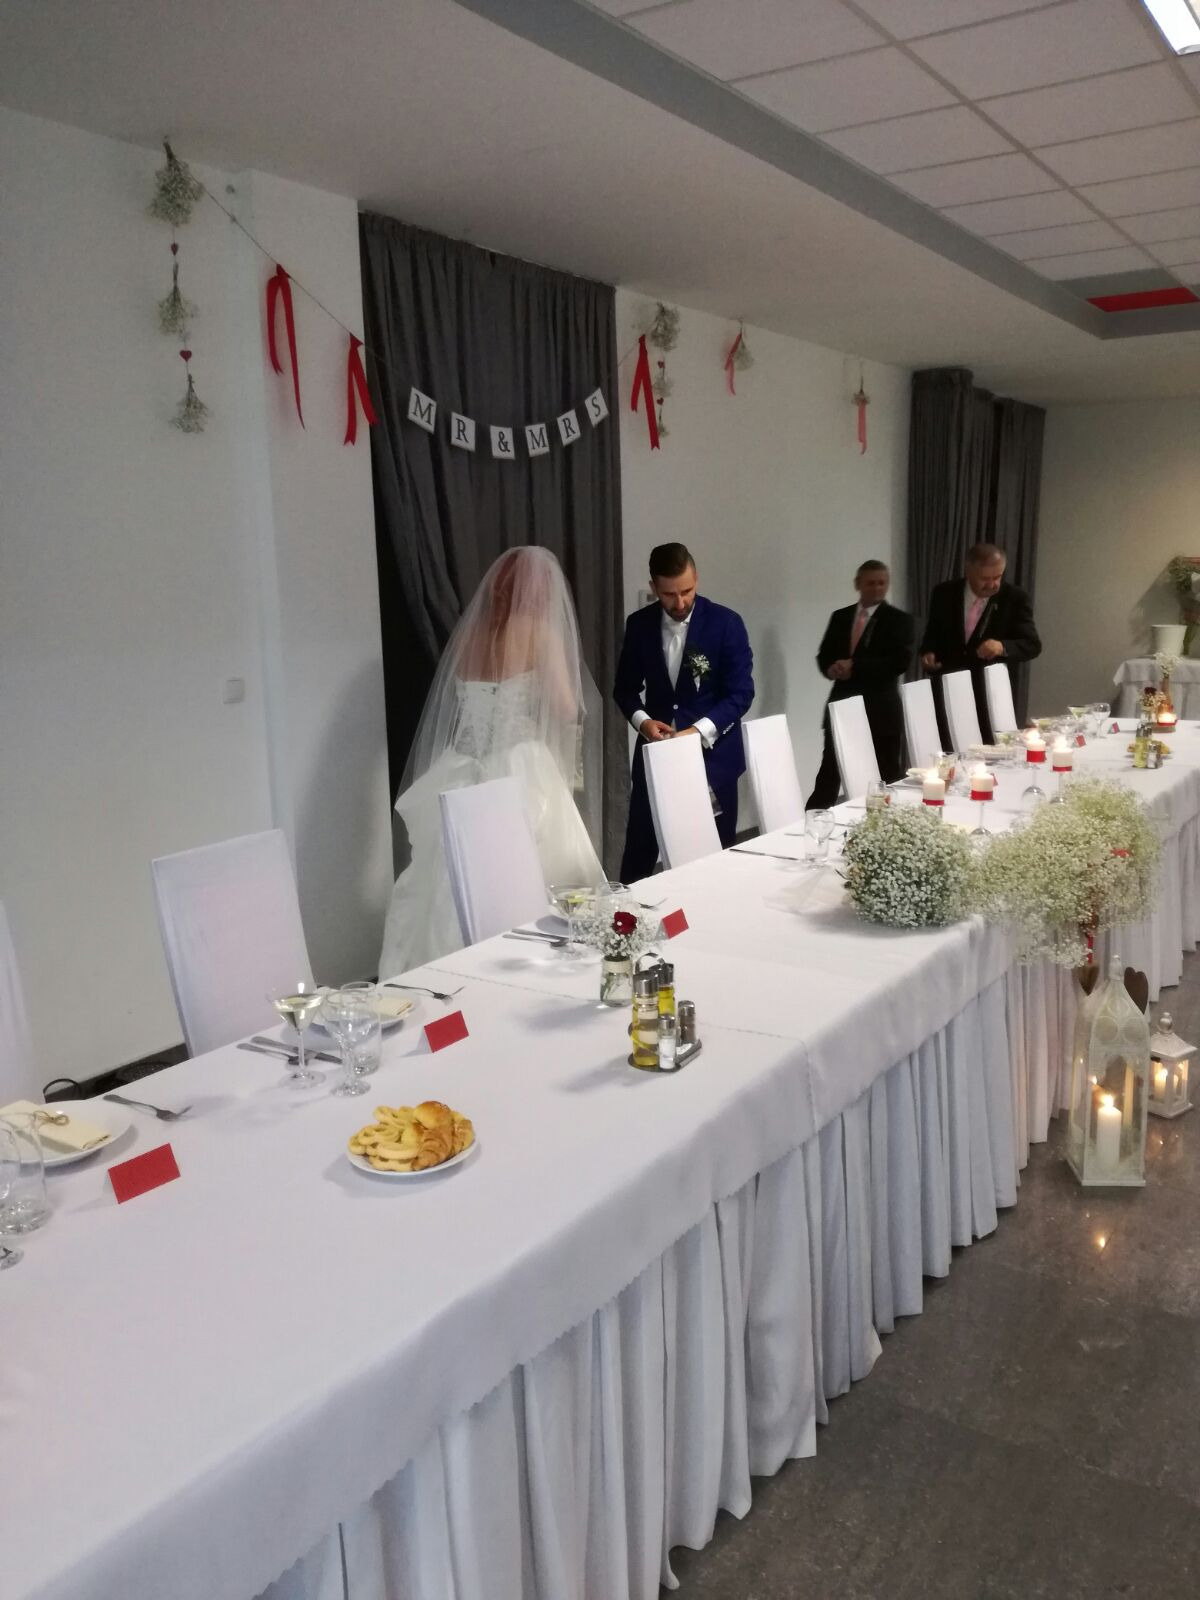 handmade svadba 😊 - Obrázok č. 3